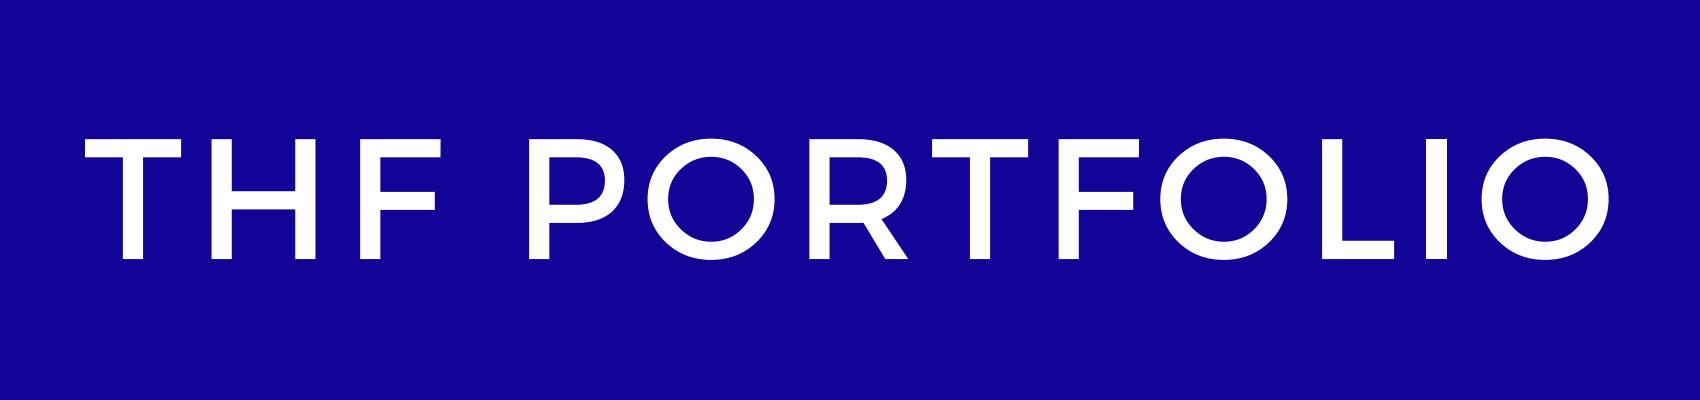 THF Portfolio